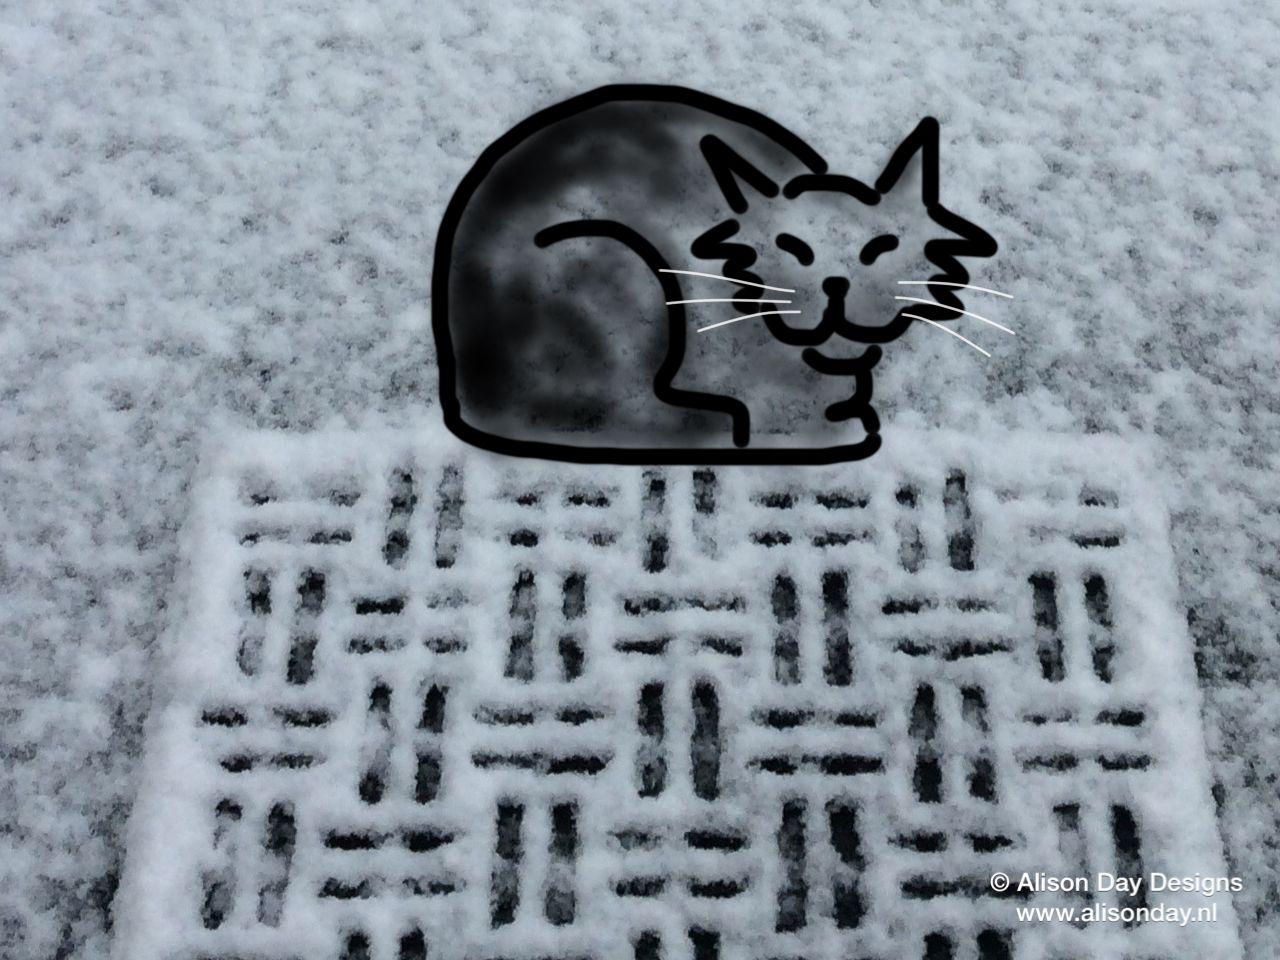 Snow mat by Alison Day Short story: http://alisondaydesigns.blogspot.nl/2016/01/snow-mat.html